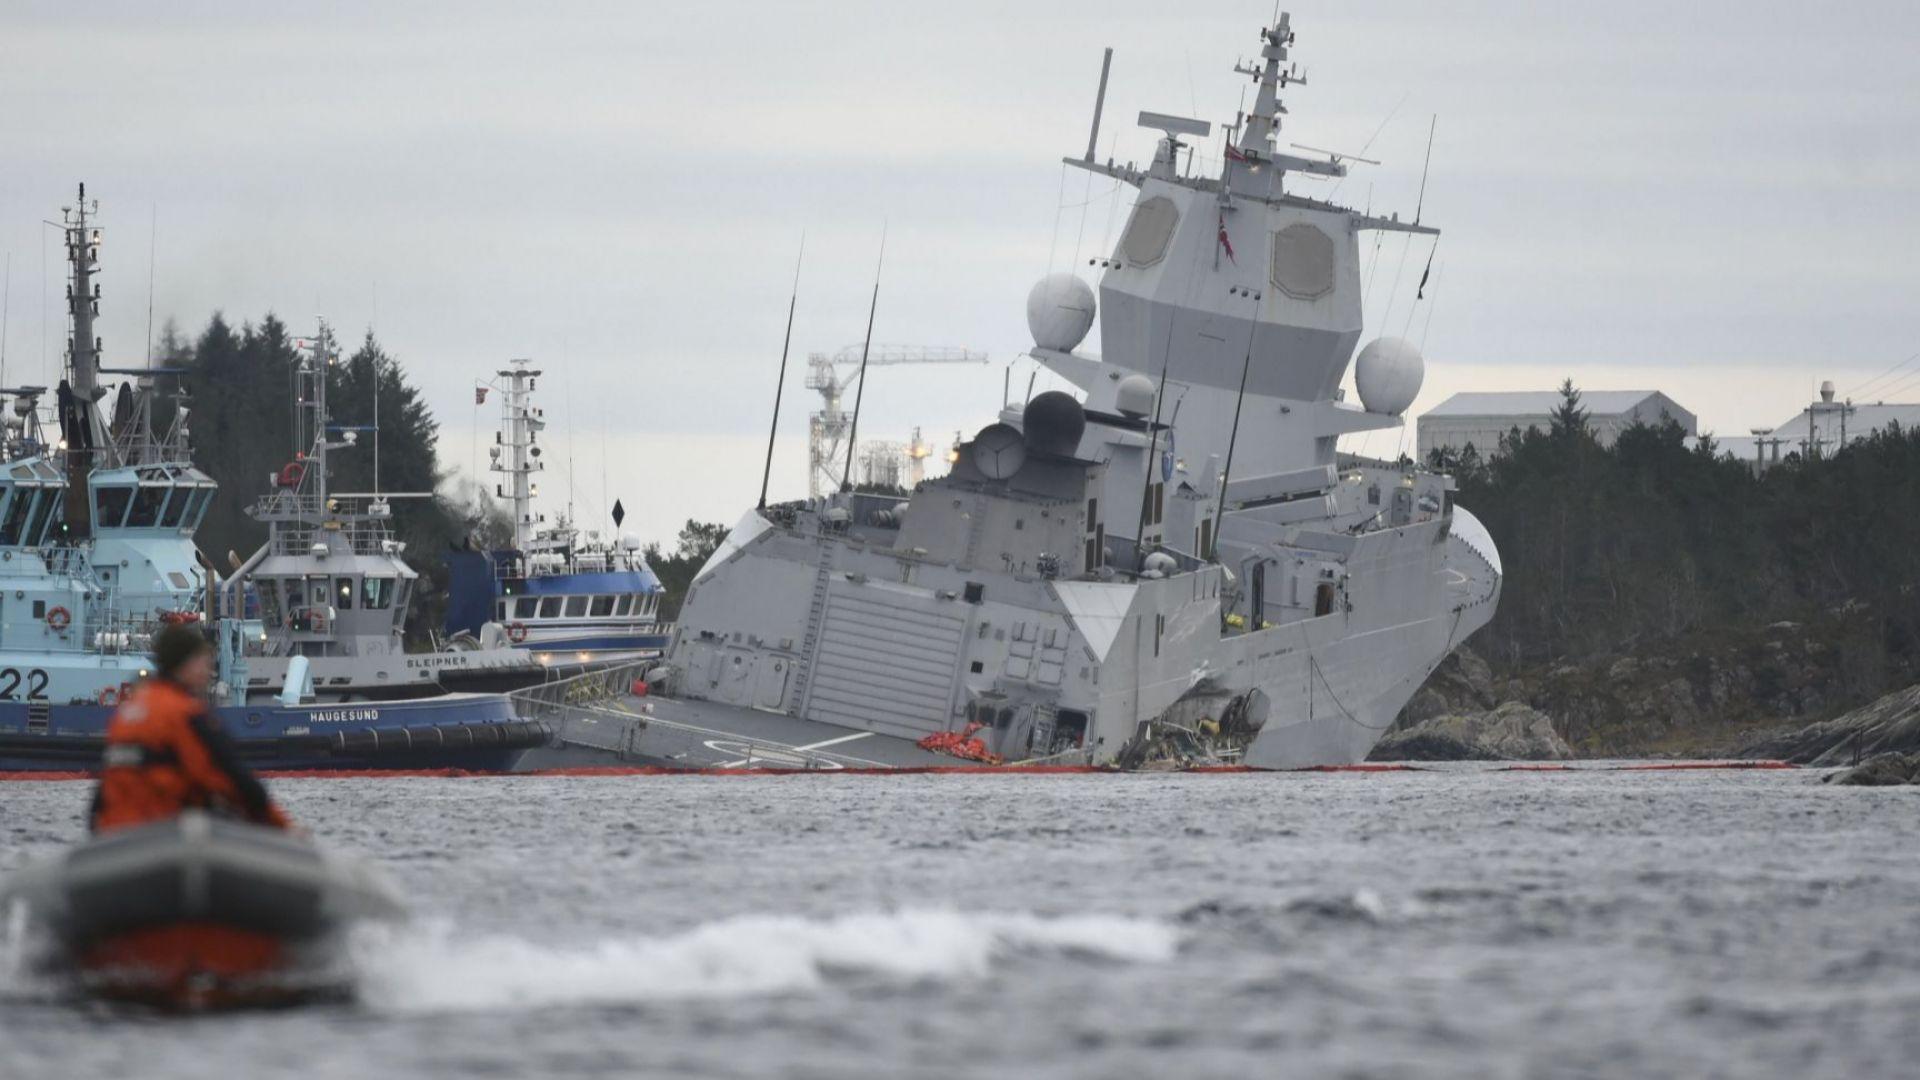 Военна фрегата и танкер се удариха край Норвегия (видео)